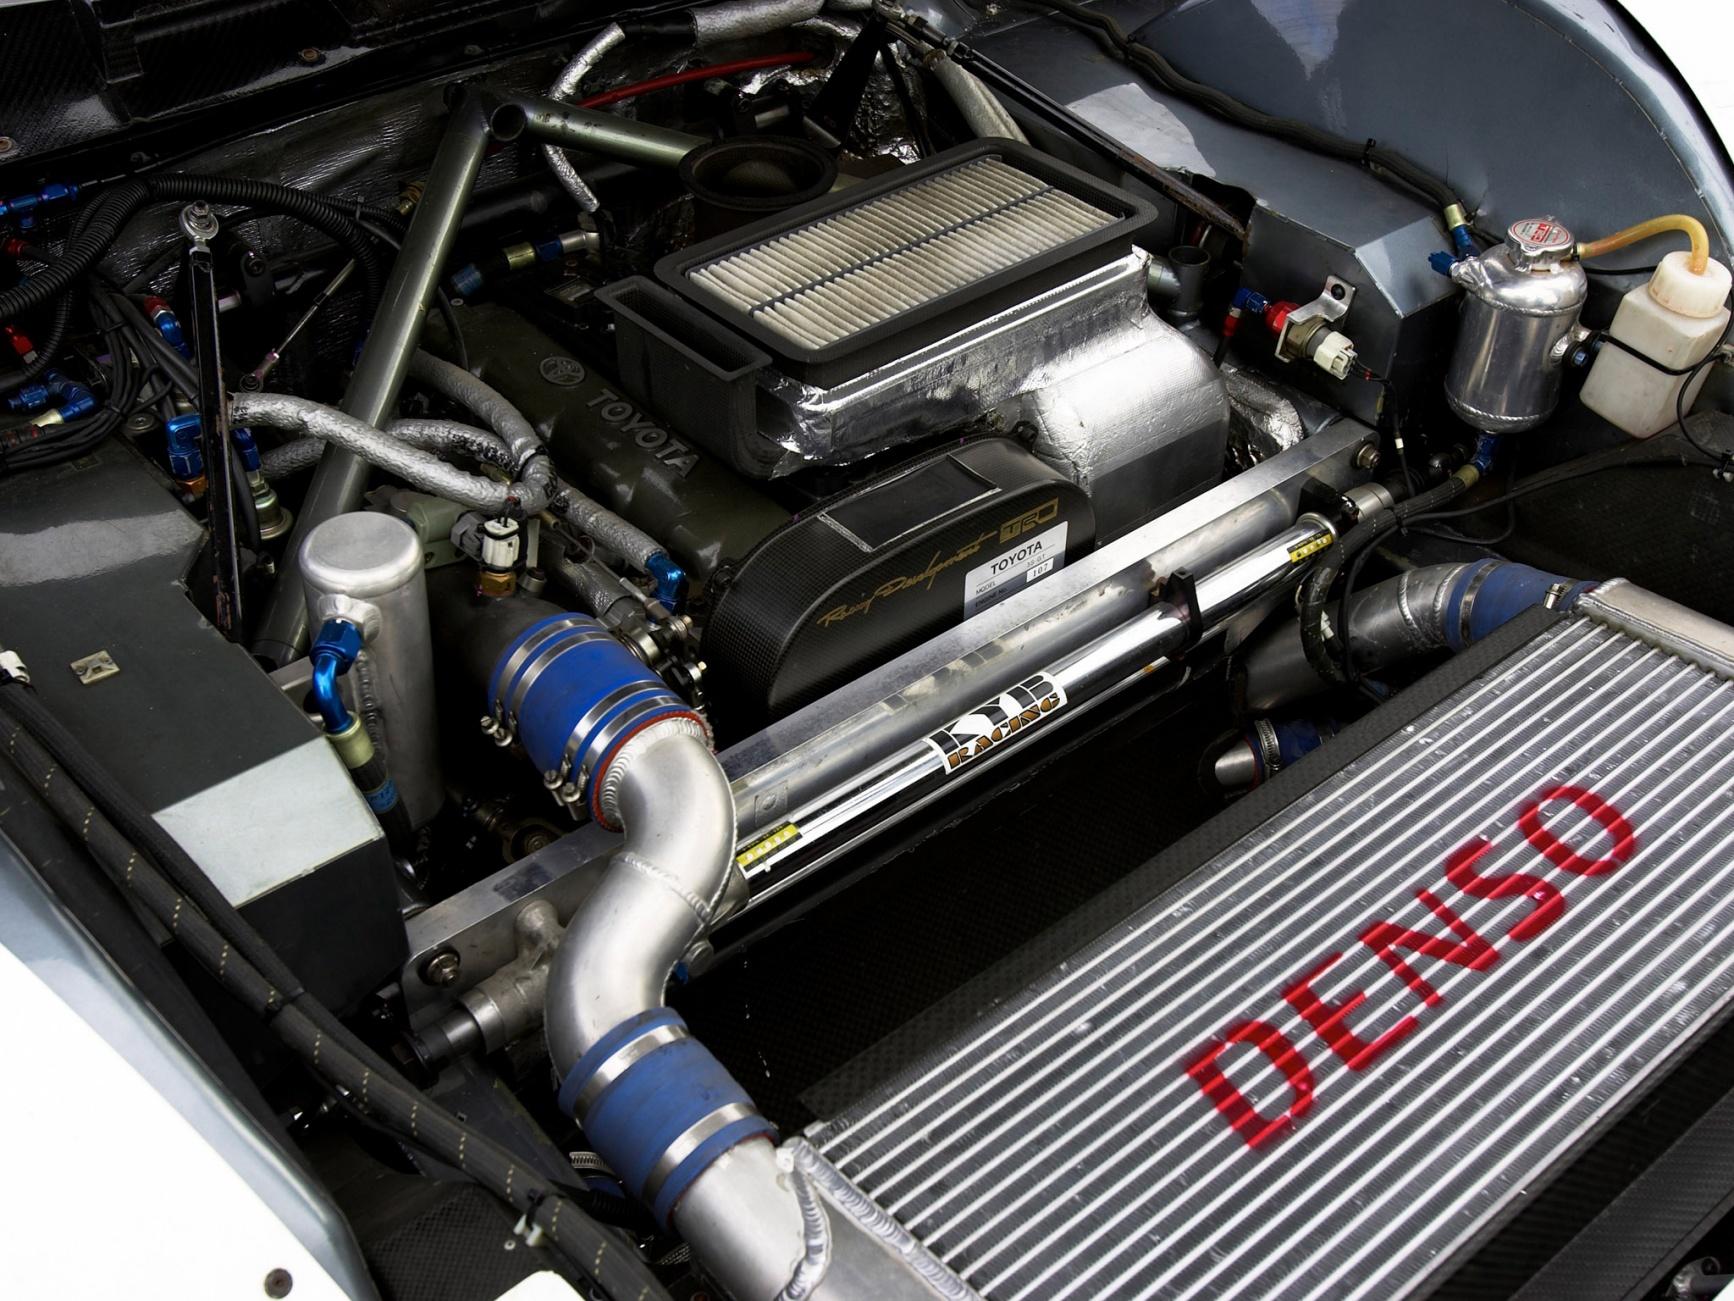 1995 toyota supra gt500 jgtc supercar supercars race racing engine engines wallpaper 1734x1301. Black Bedroom Furniture Sets. Home Design Ideas